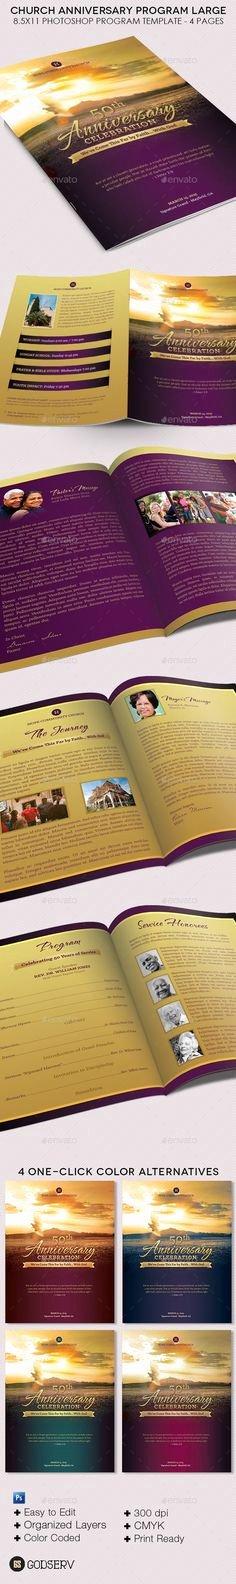 Church Program Template Free Lovely Free Printable Church Program Template